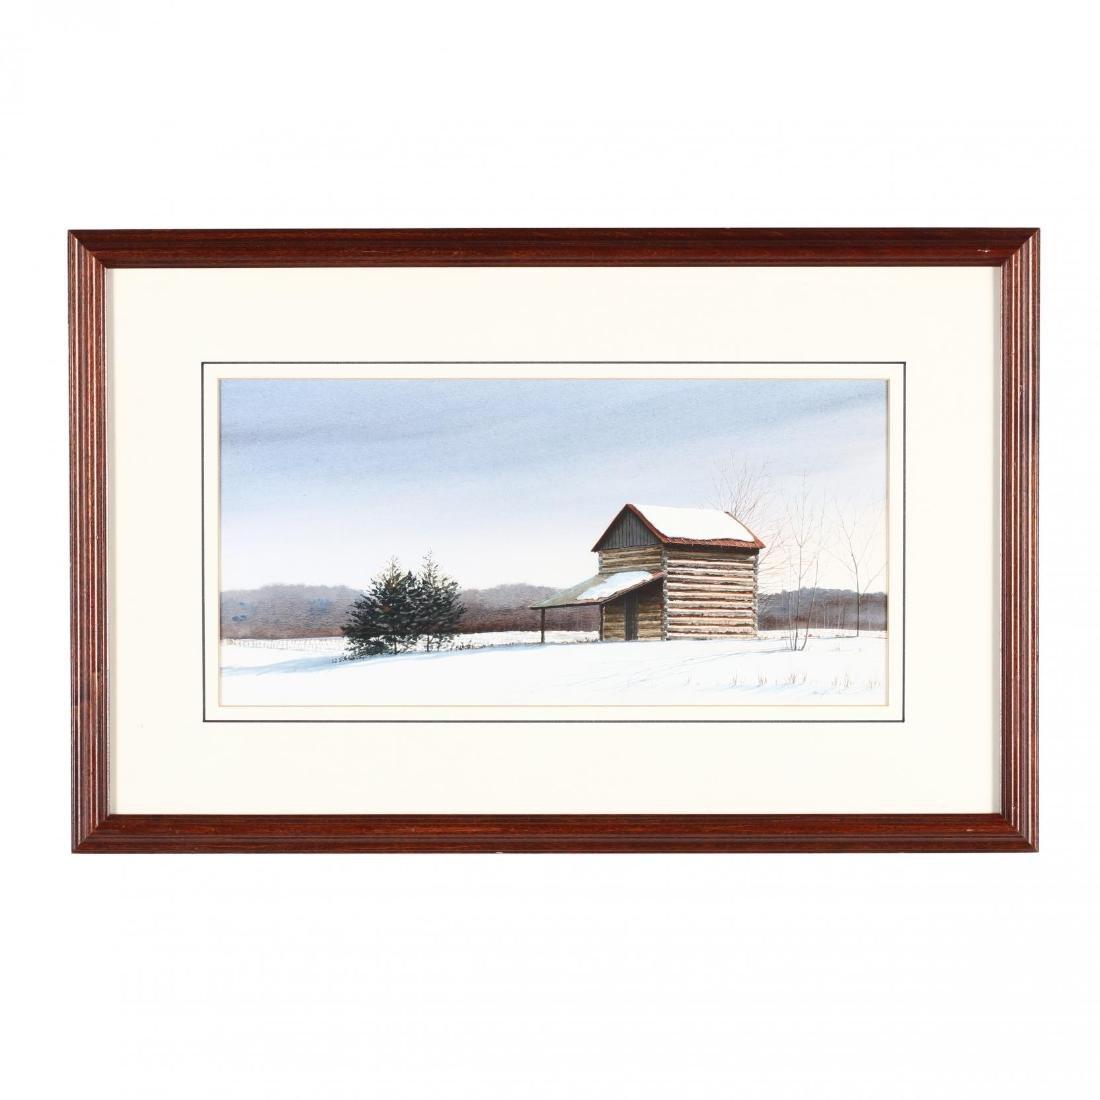 Douglas Cave (NC), Winter Landscape with Tobacco Barn